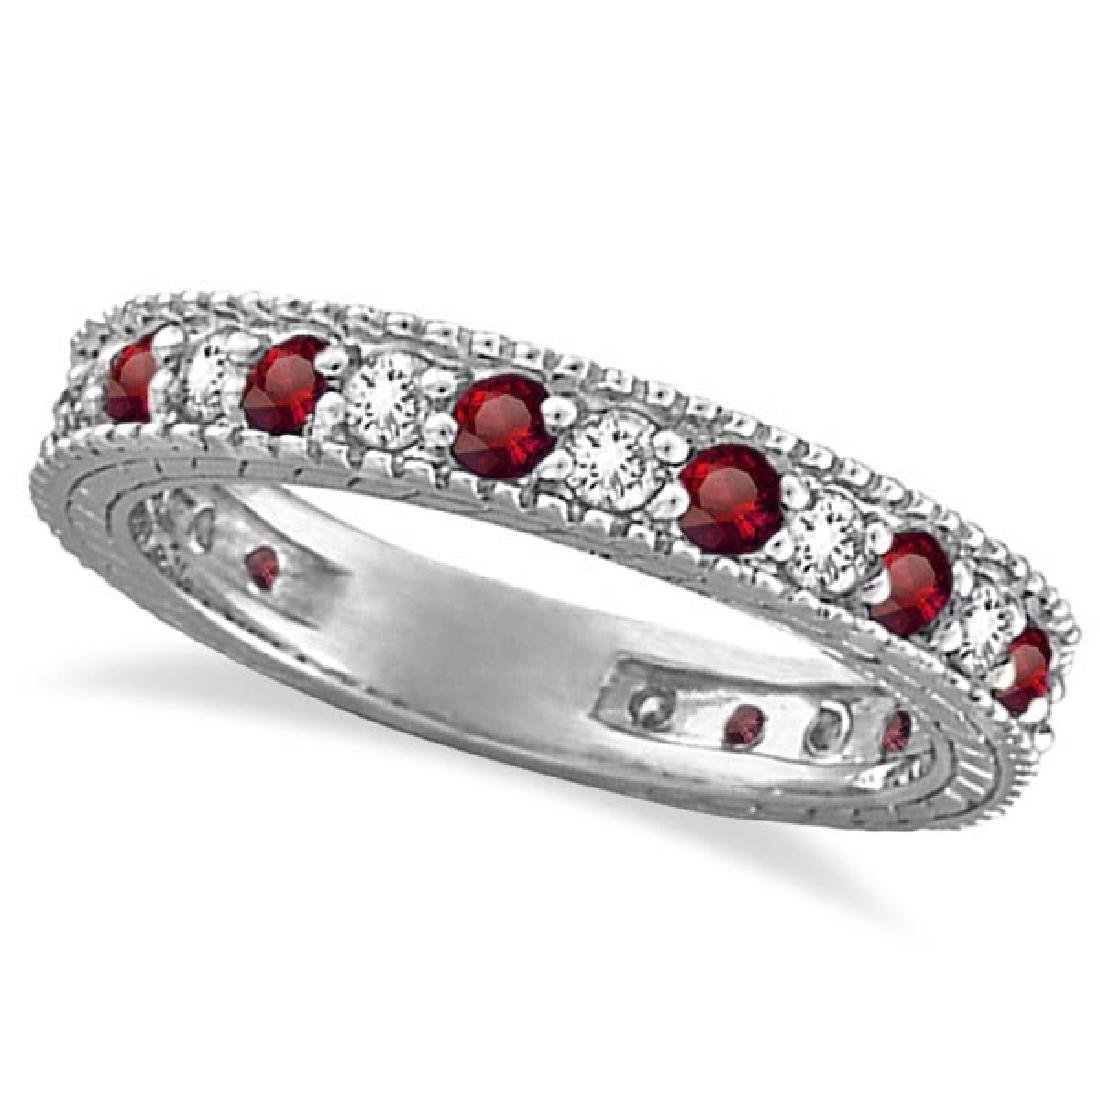 Diamond and Garnet Eternity Ring Filigree Band 14k Whit